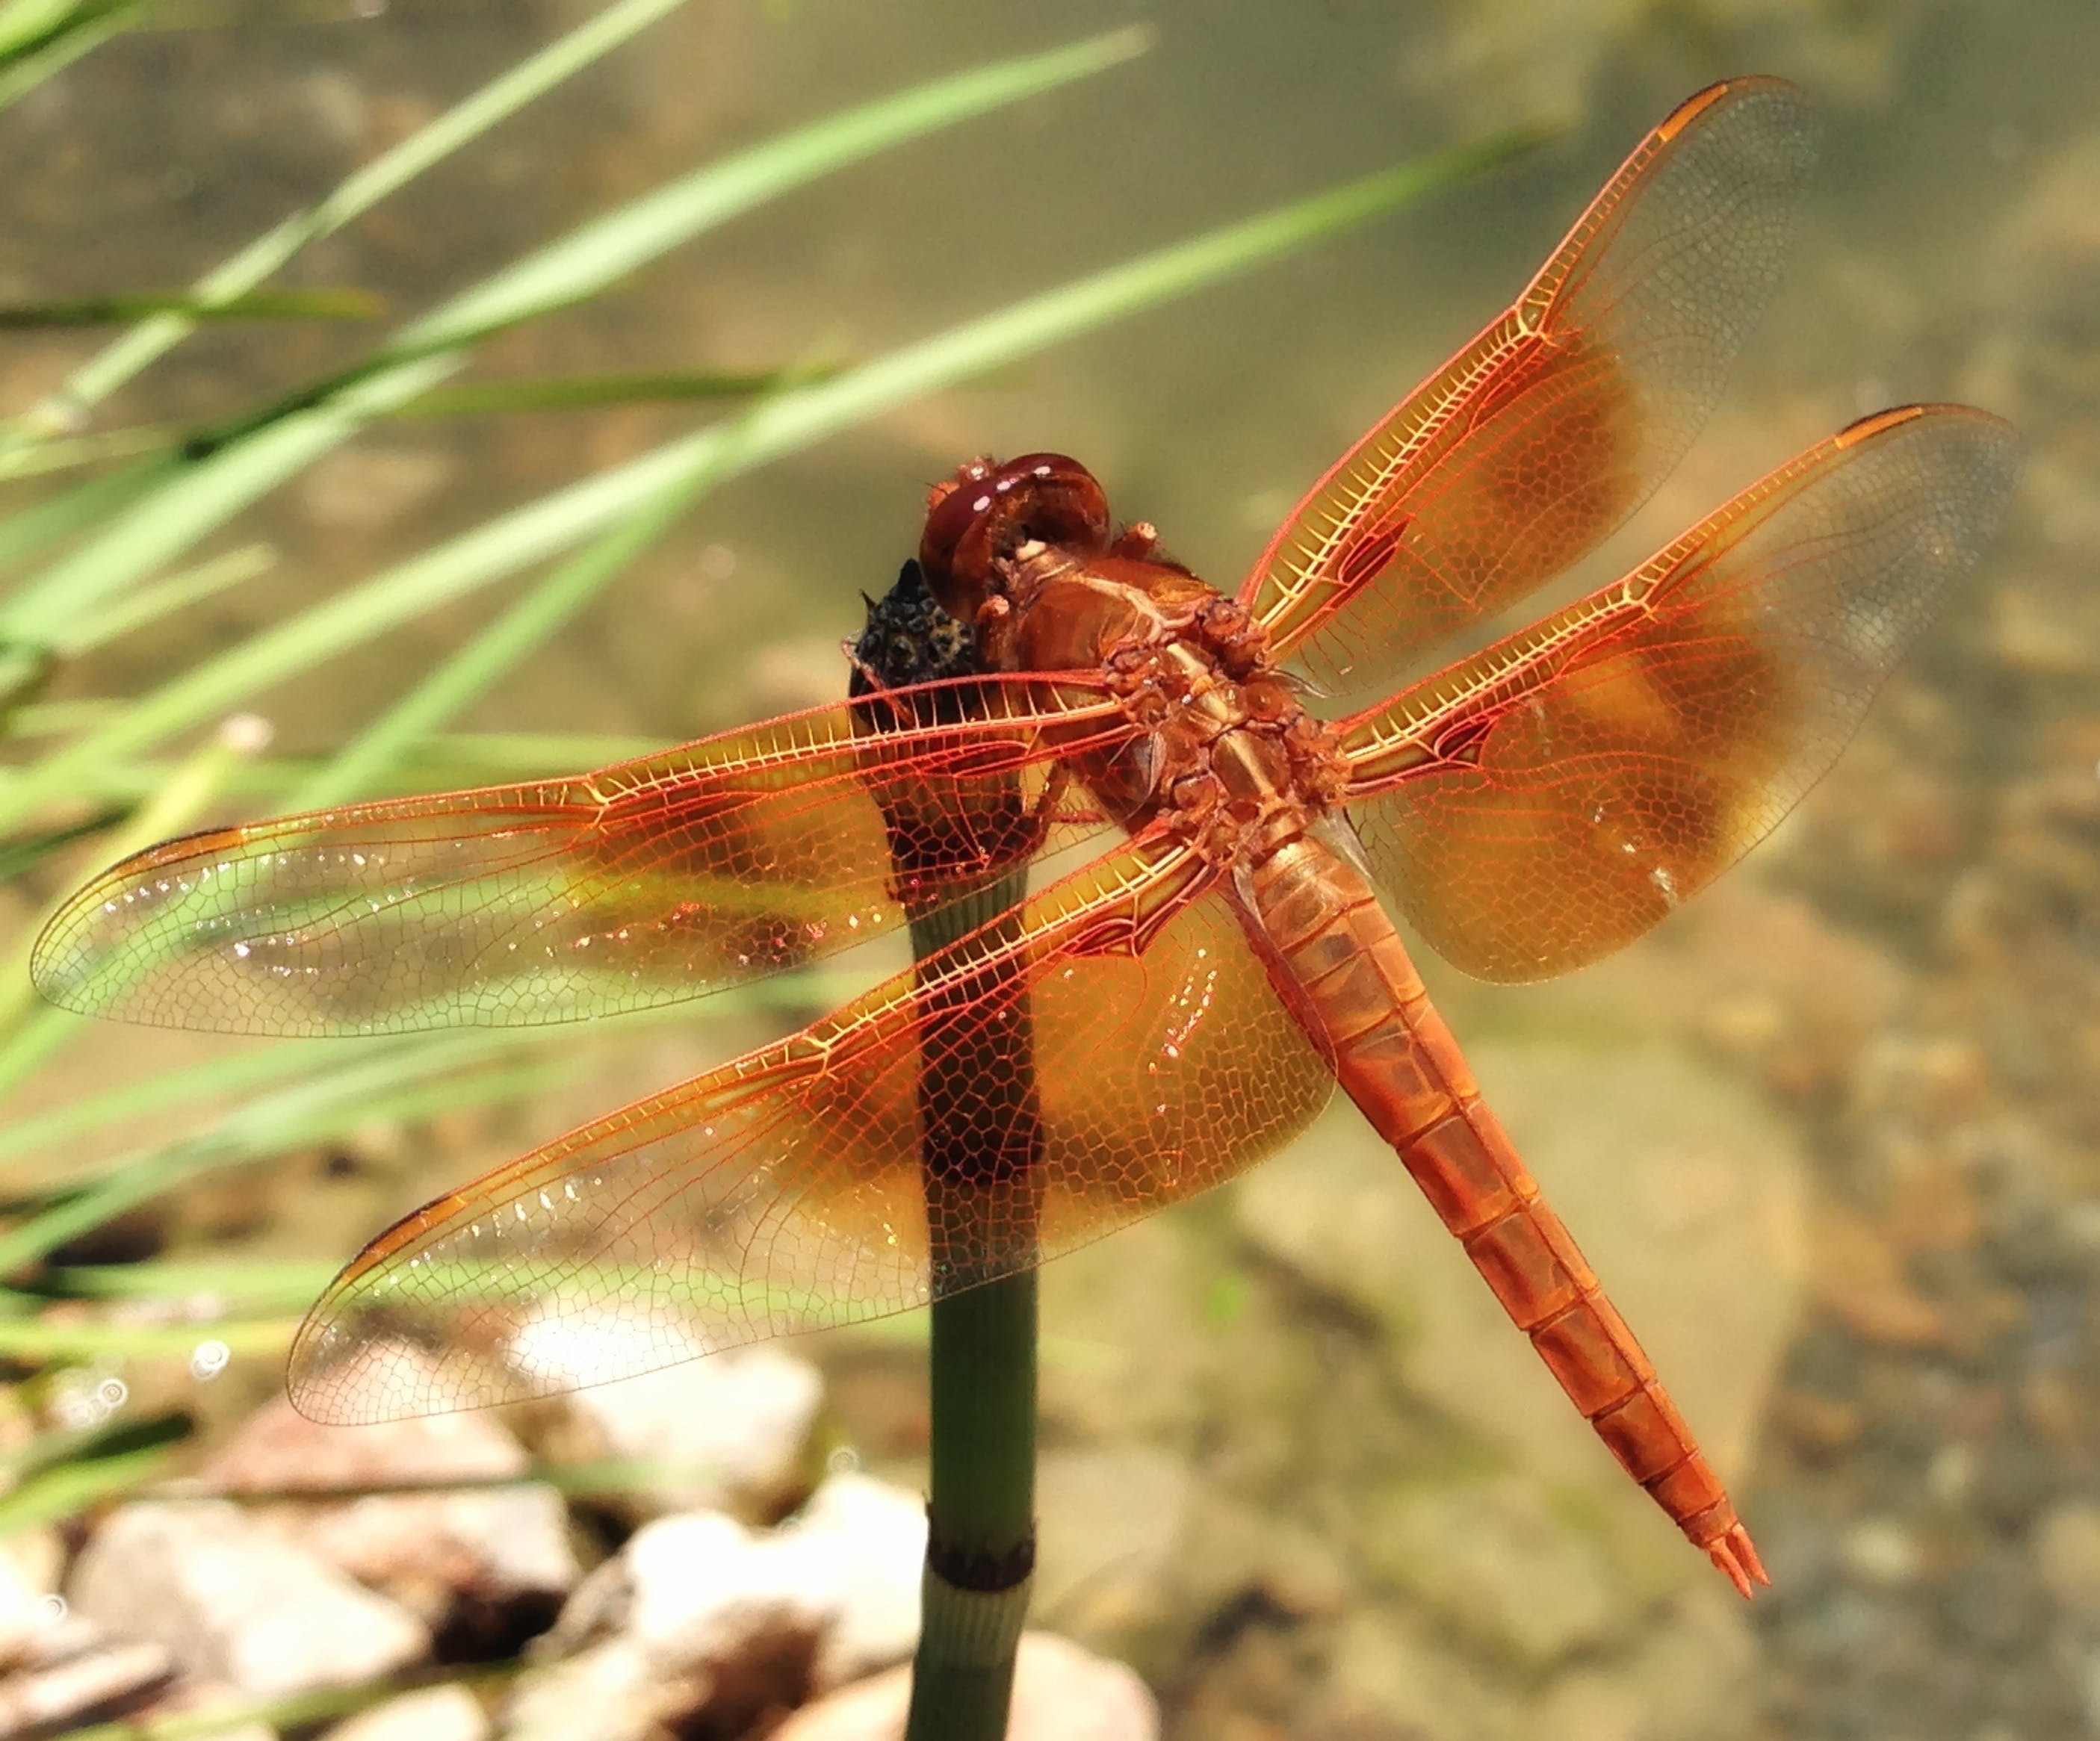 Red Dragonfly on Leaf